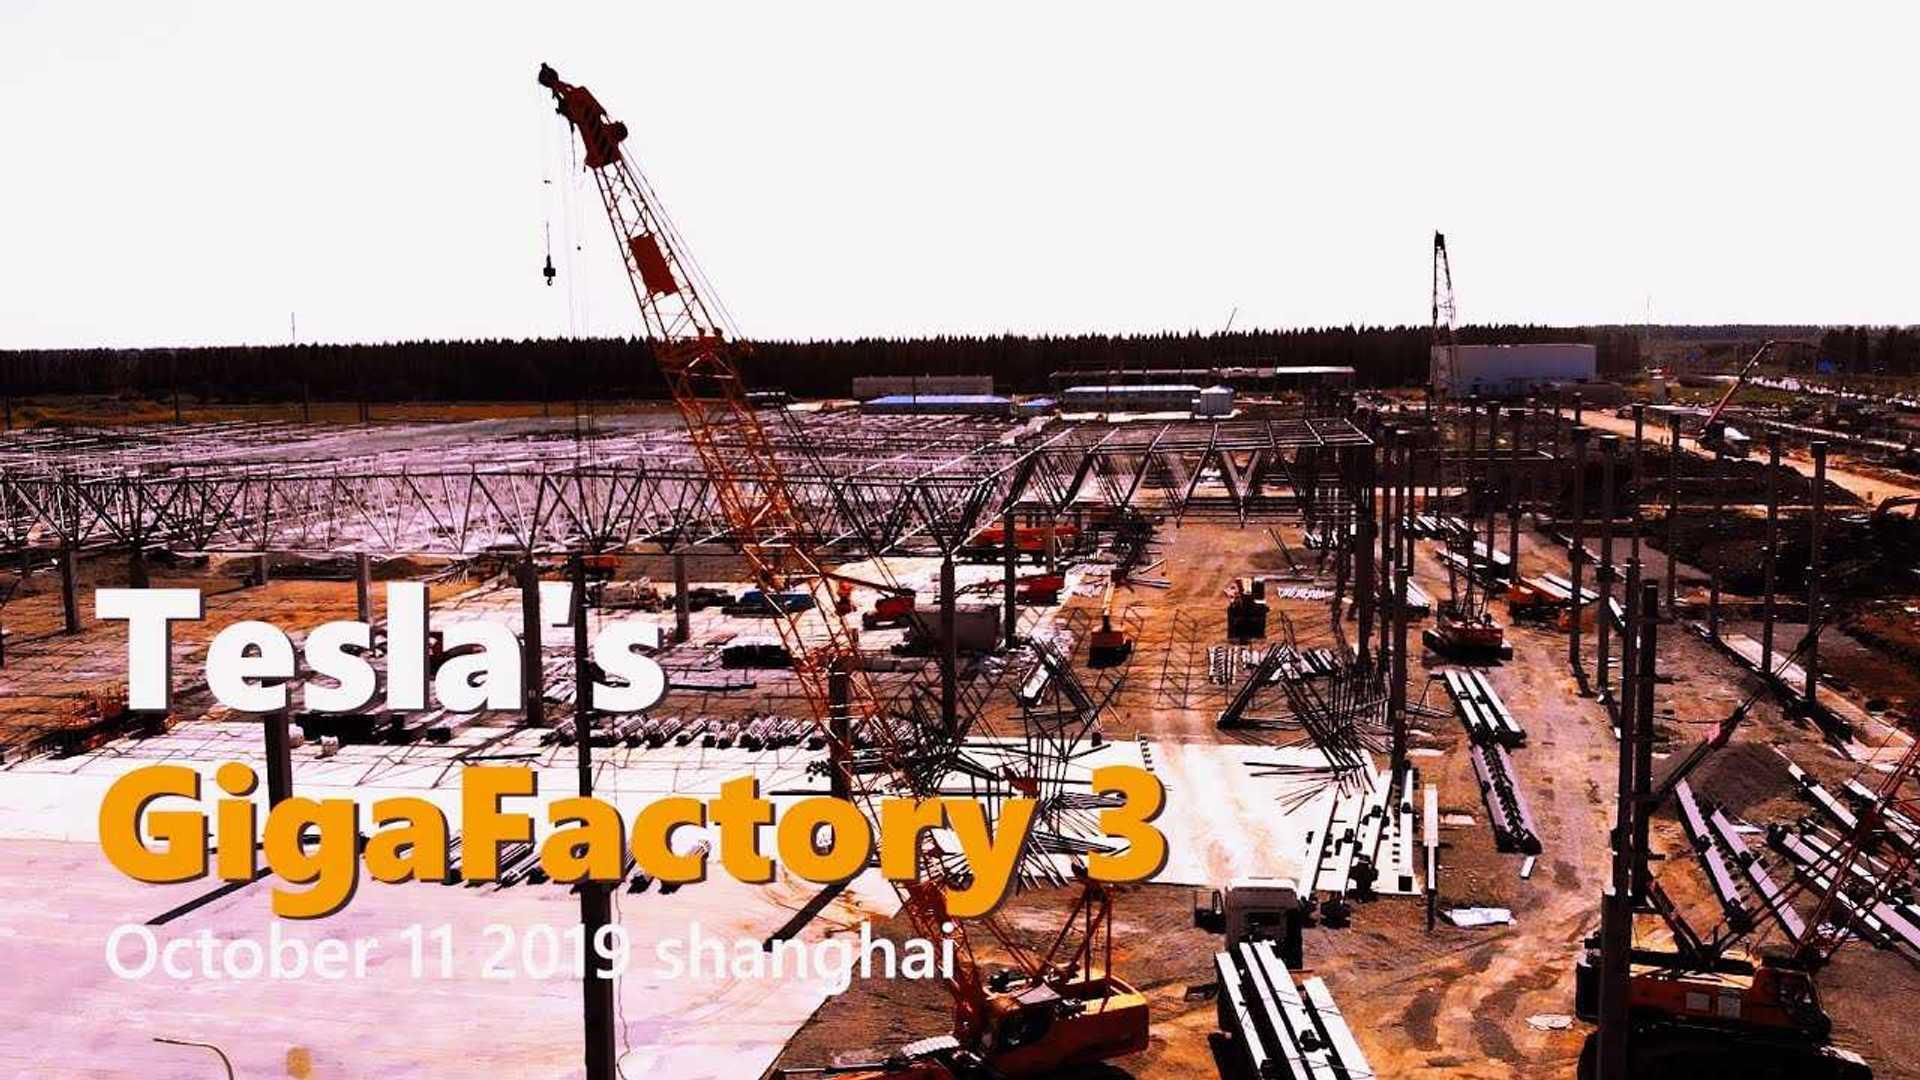 Tesla Gigafactory 3 Construction Progress October 11, 2019: Video